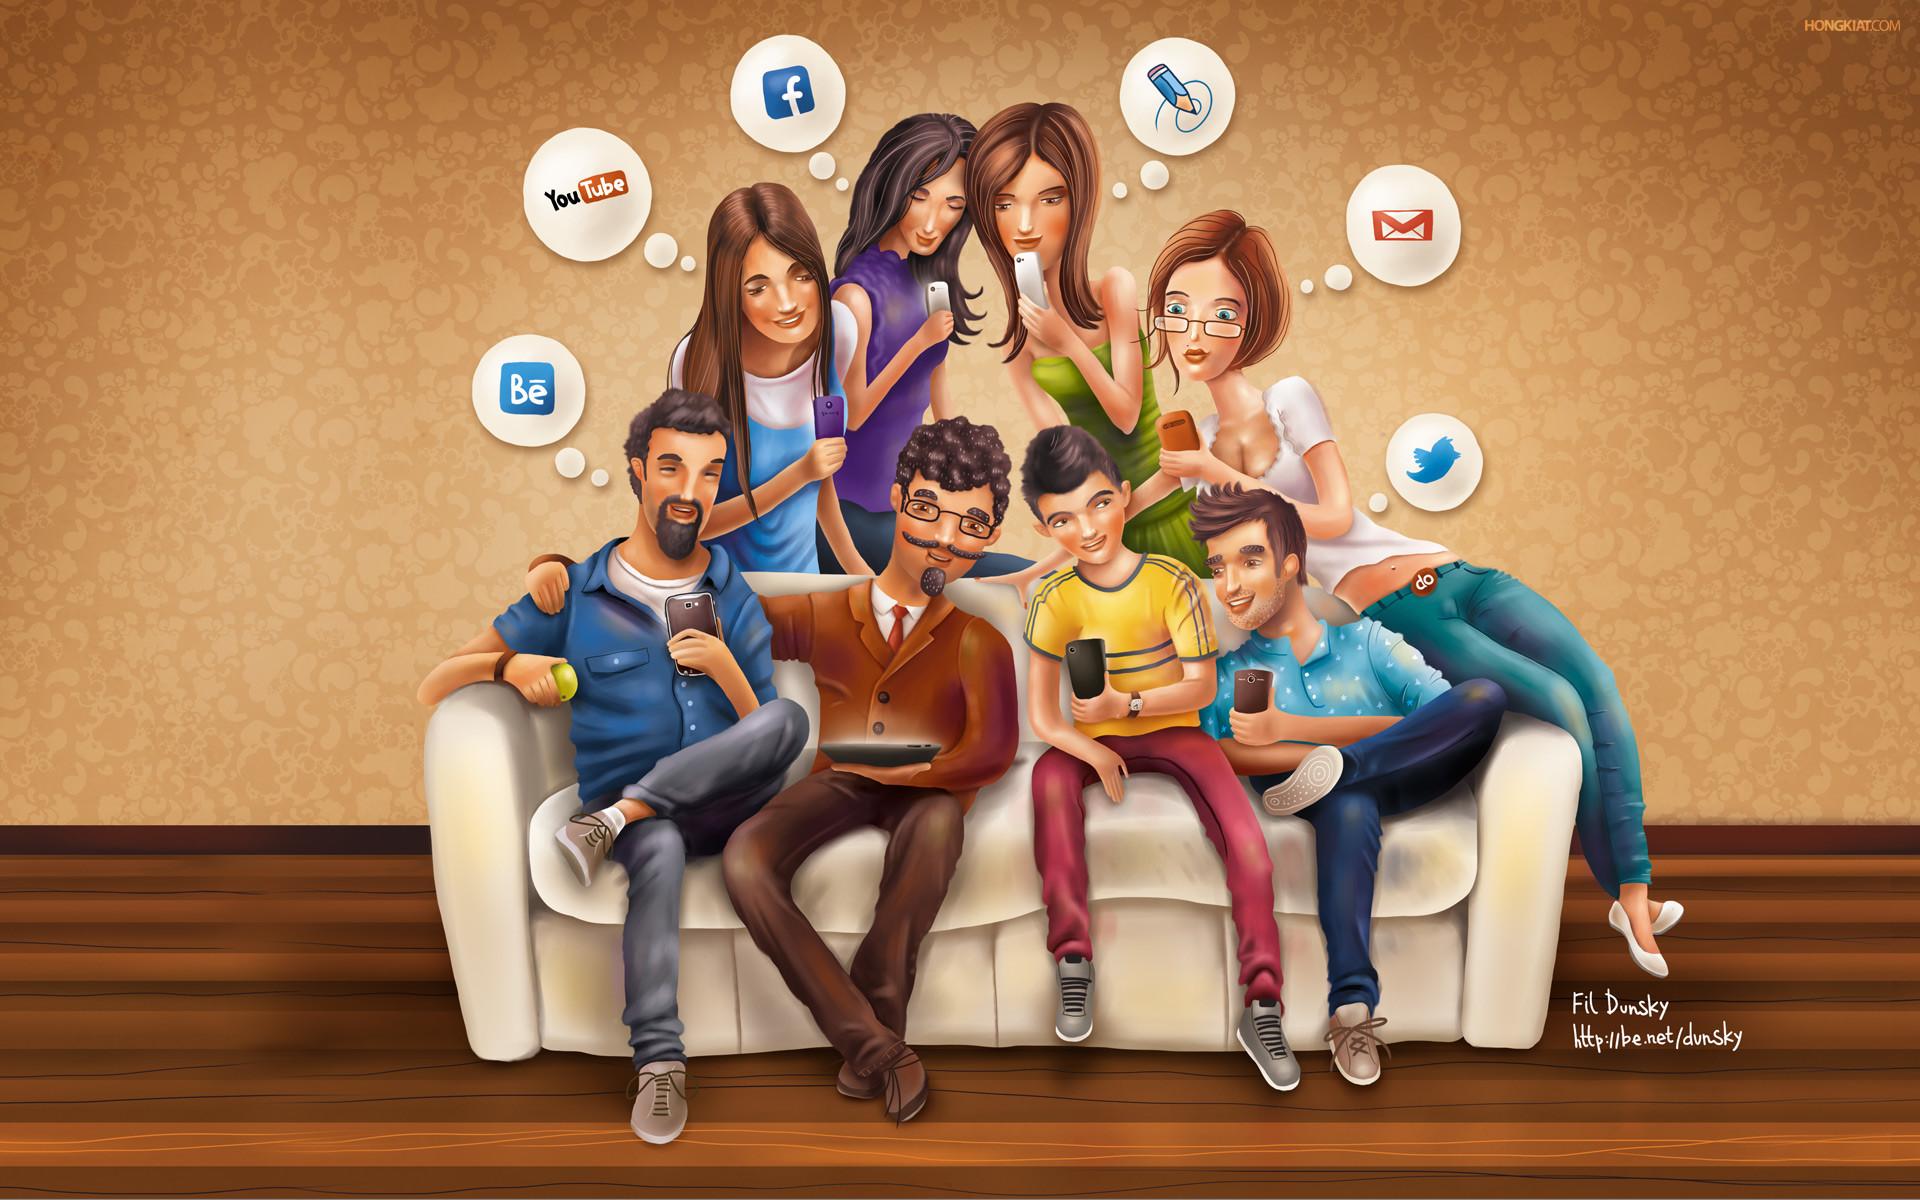 Social Media Wallpapers   HD Wallpapers